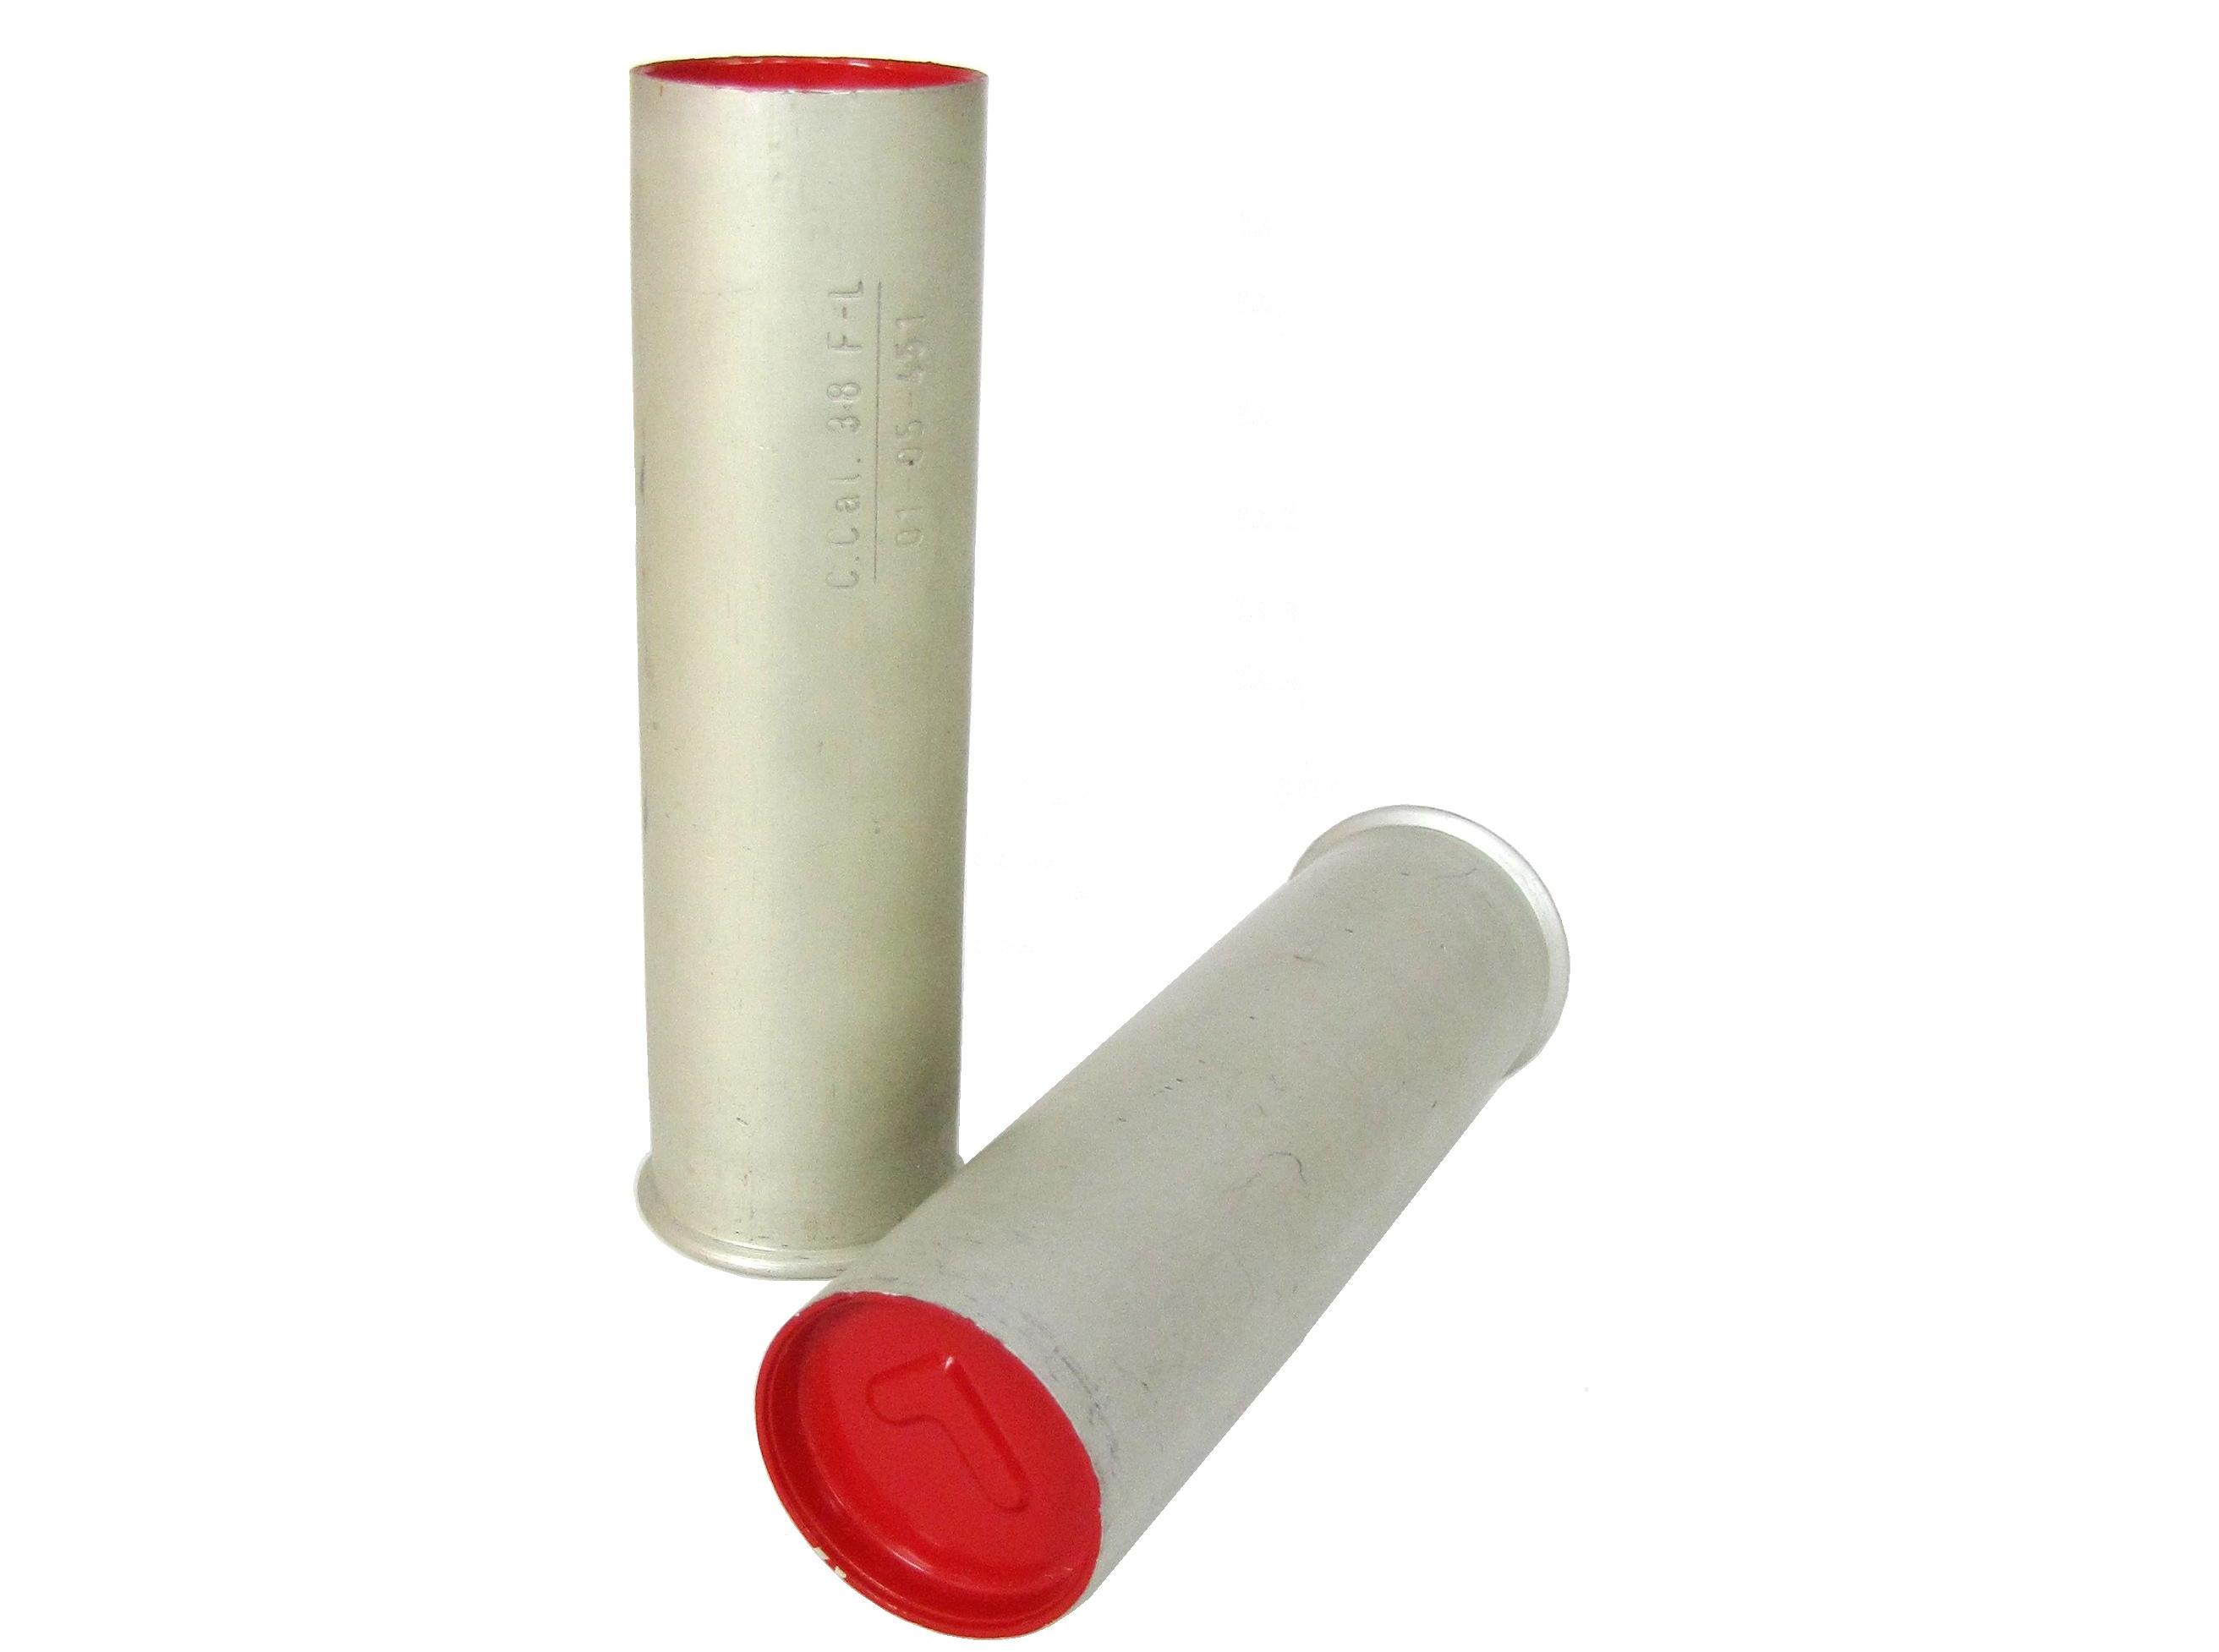 Cartus fumigen-lacrimogen 38mm - Sursa: Romarm